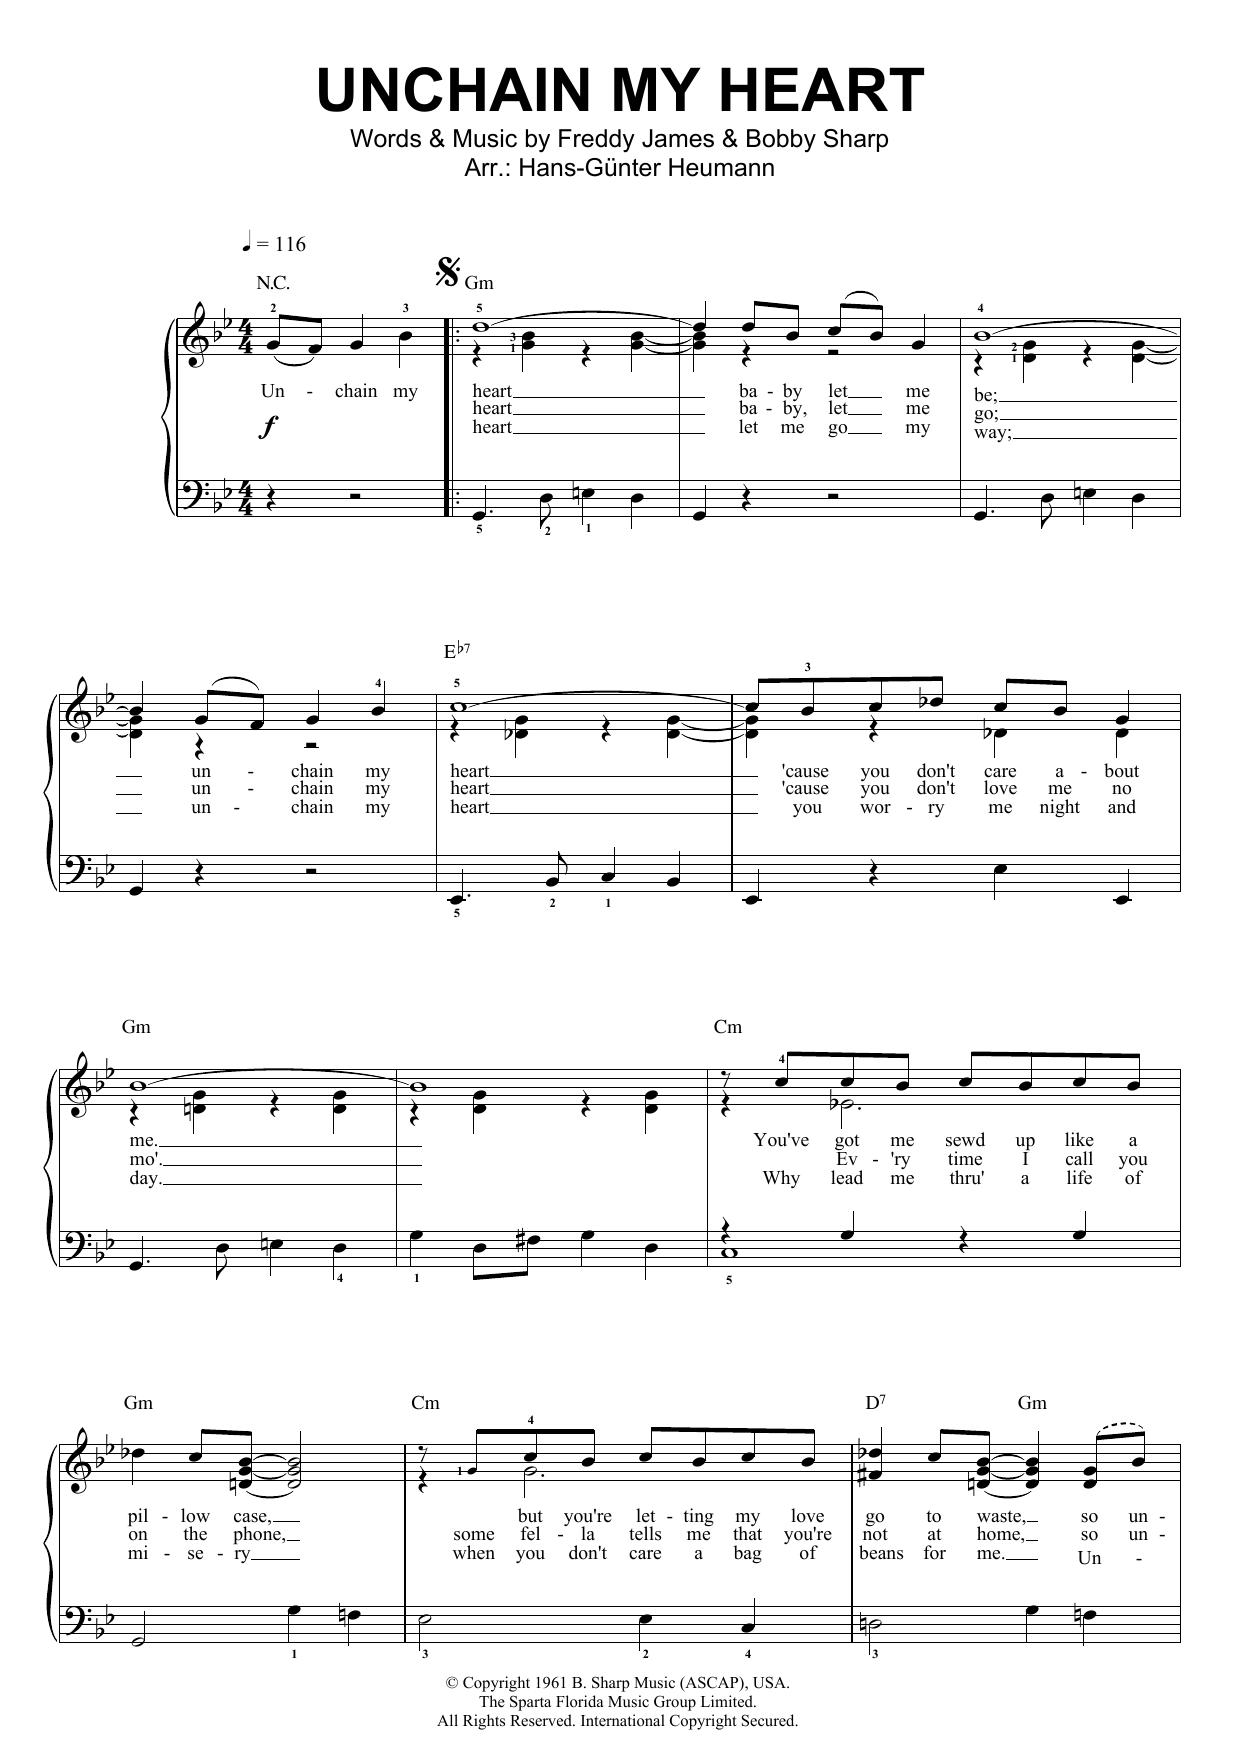 king of myt heart chords pdf